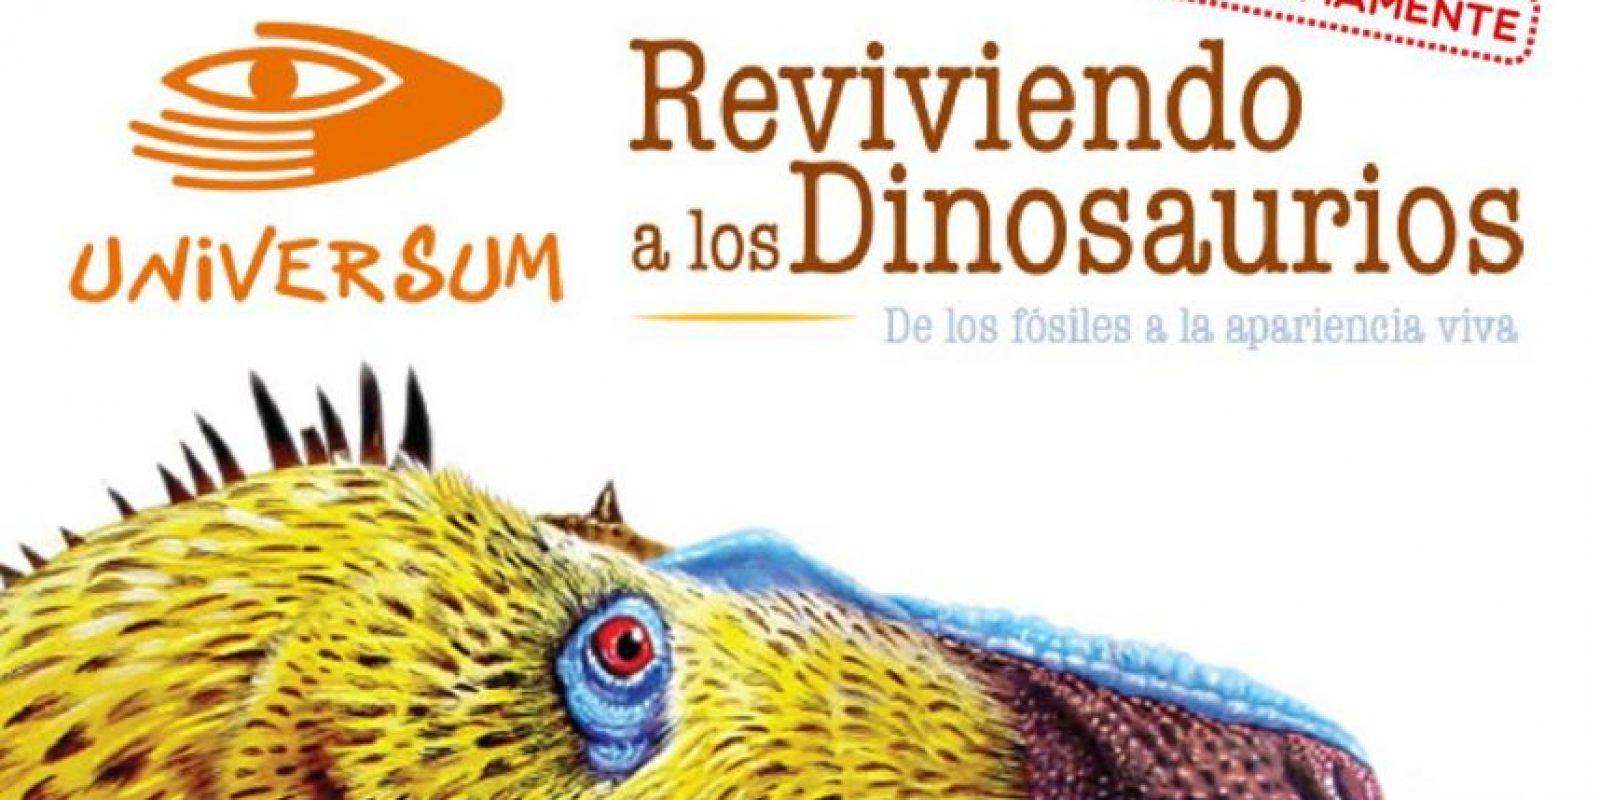 Foto:www.facebook.com/UniversumMuseo